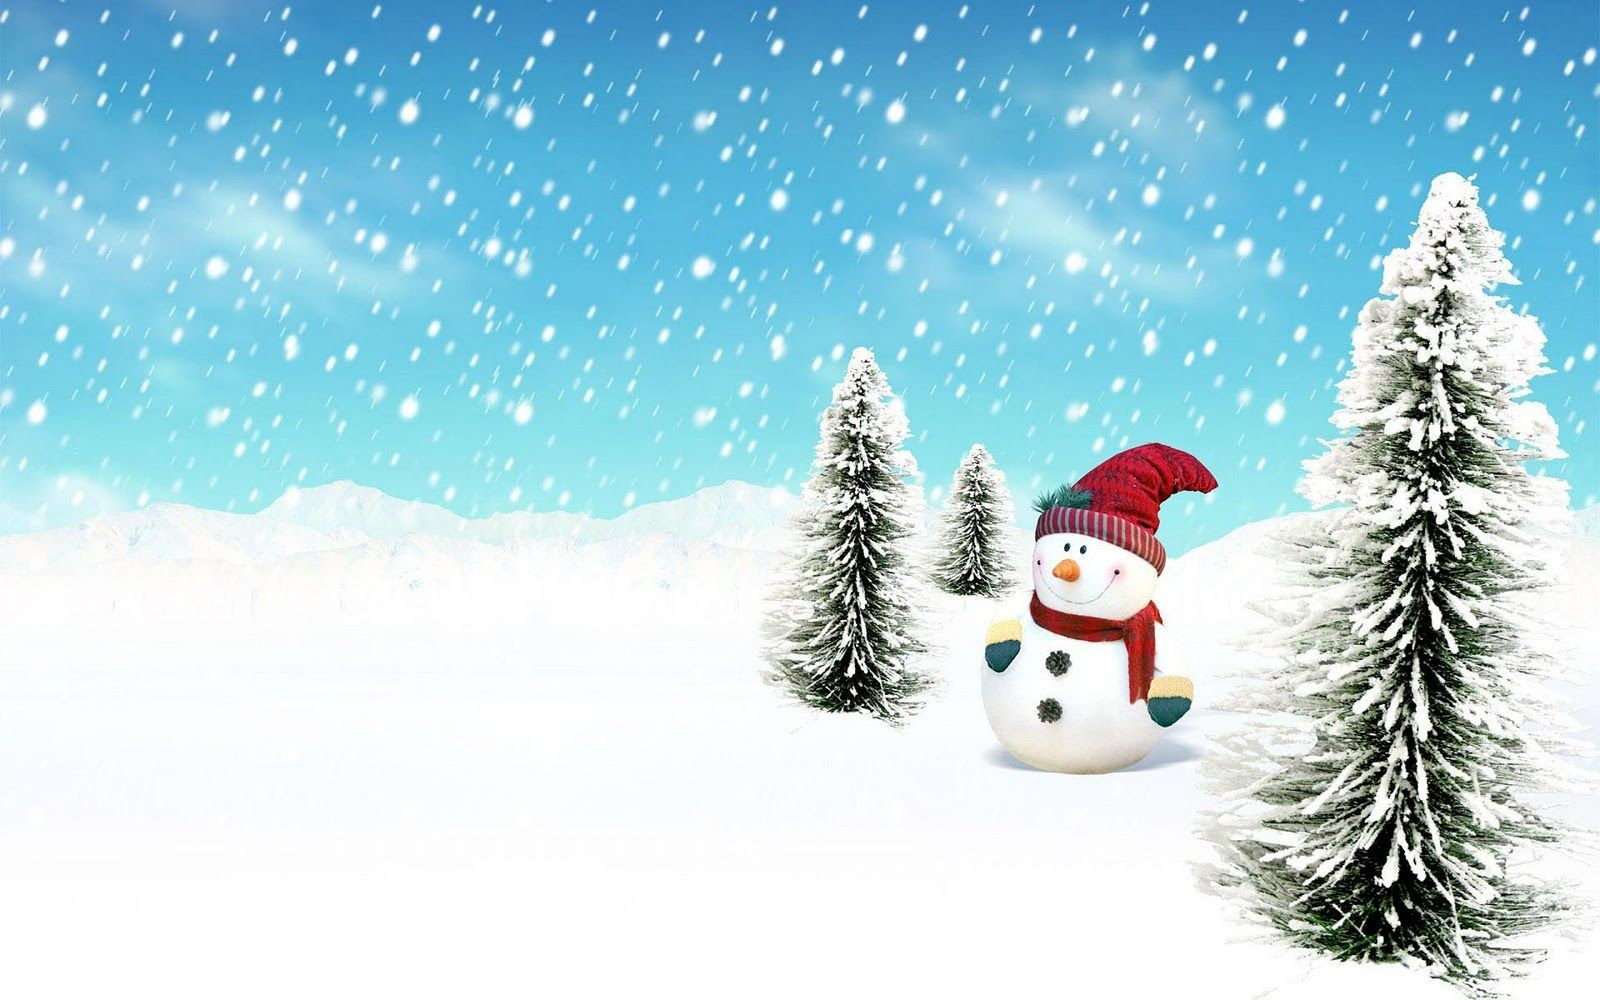 60 Let It Snowman Desktop Wallpapers   Download at WallpaperBro 1600x1000